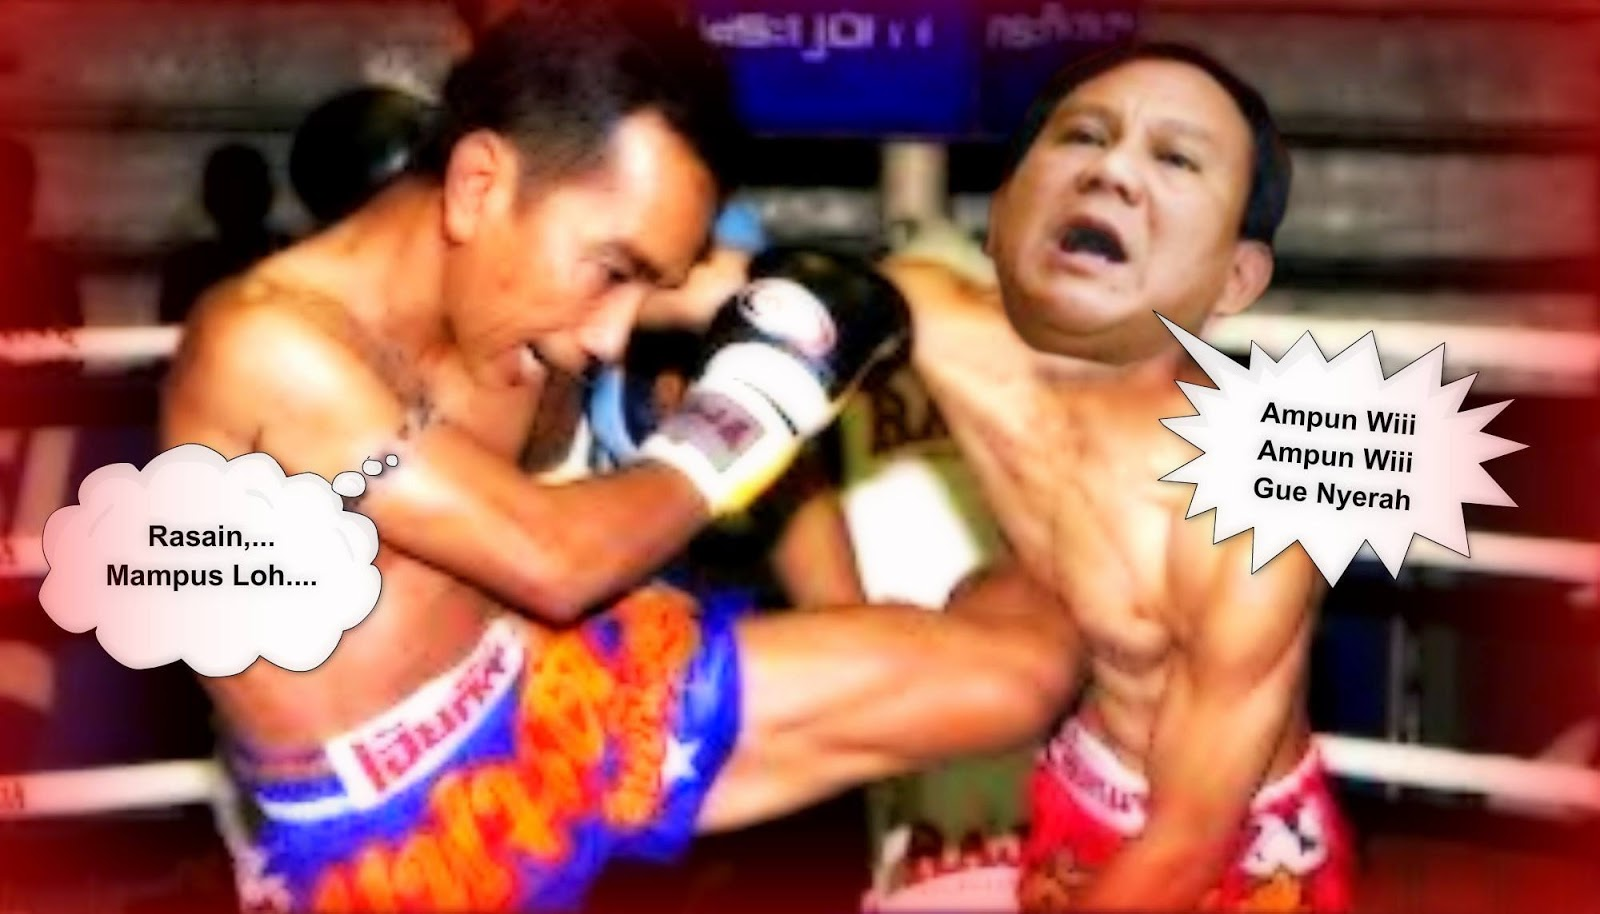 Kumpulan Foto Lucu Prabowo Vs Jokowi Download Tips Trik Gratis